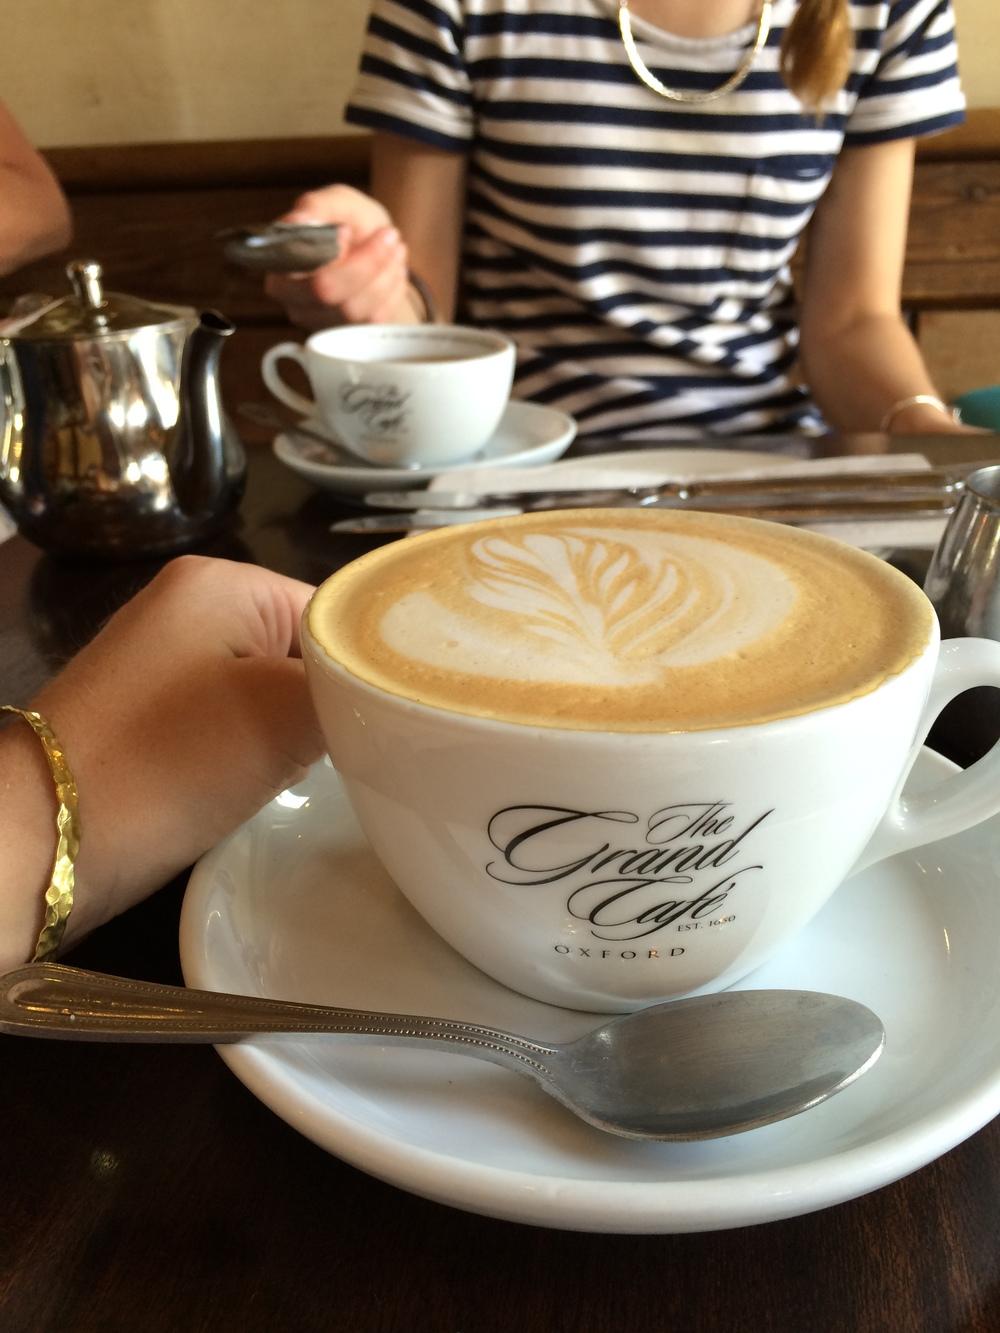 The Story Behind Love Shyla | Loveshyla.com | Oxford, The Grand Cafe